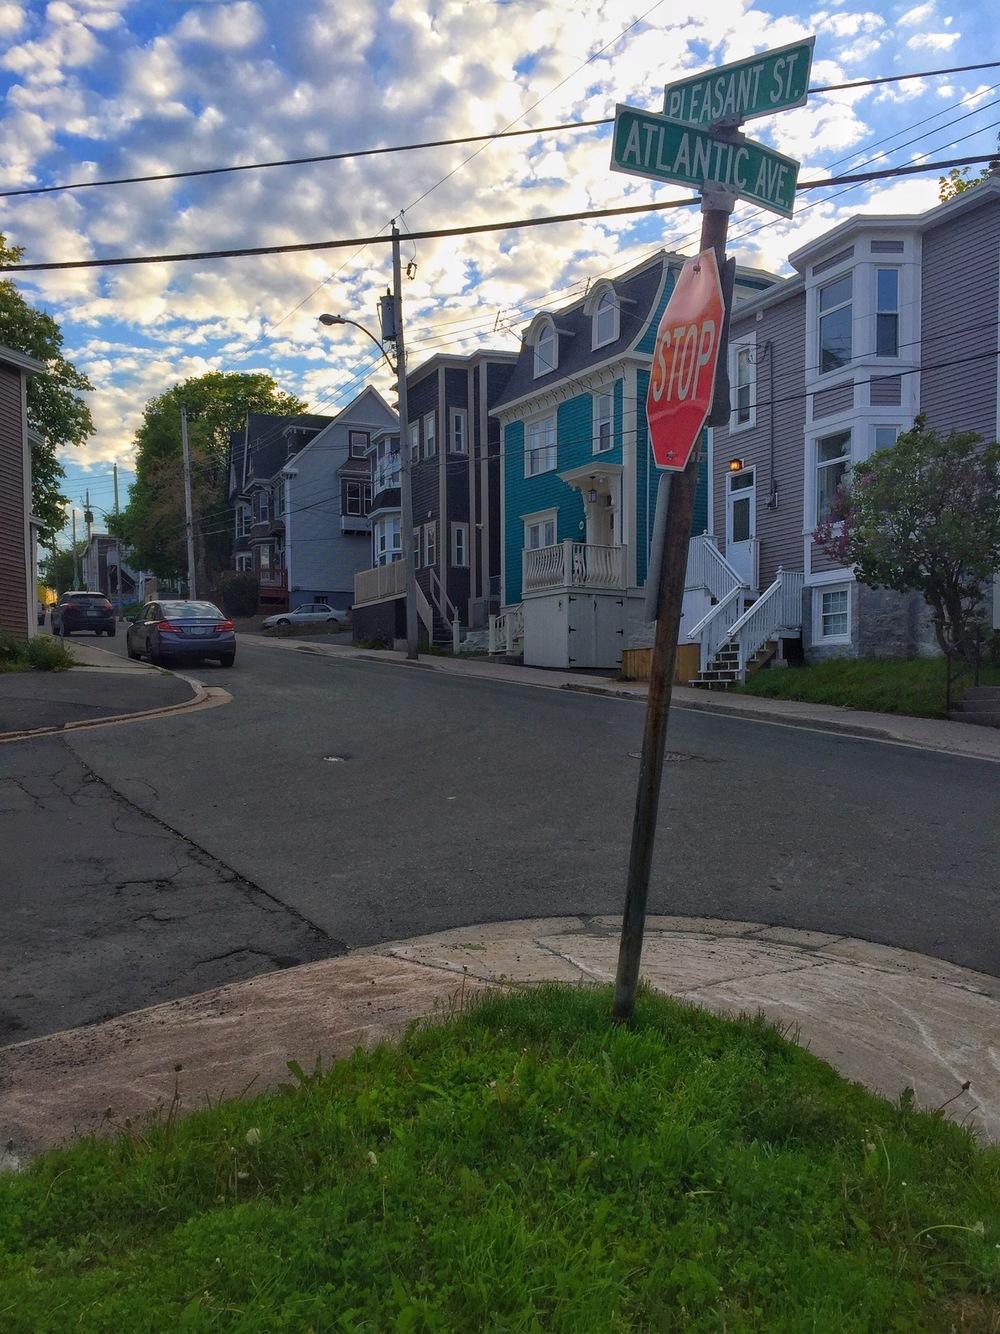 Atlantic and Pleasant Streets